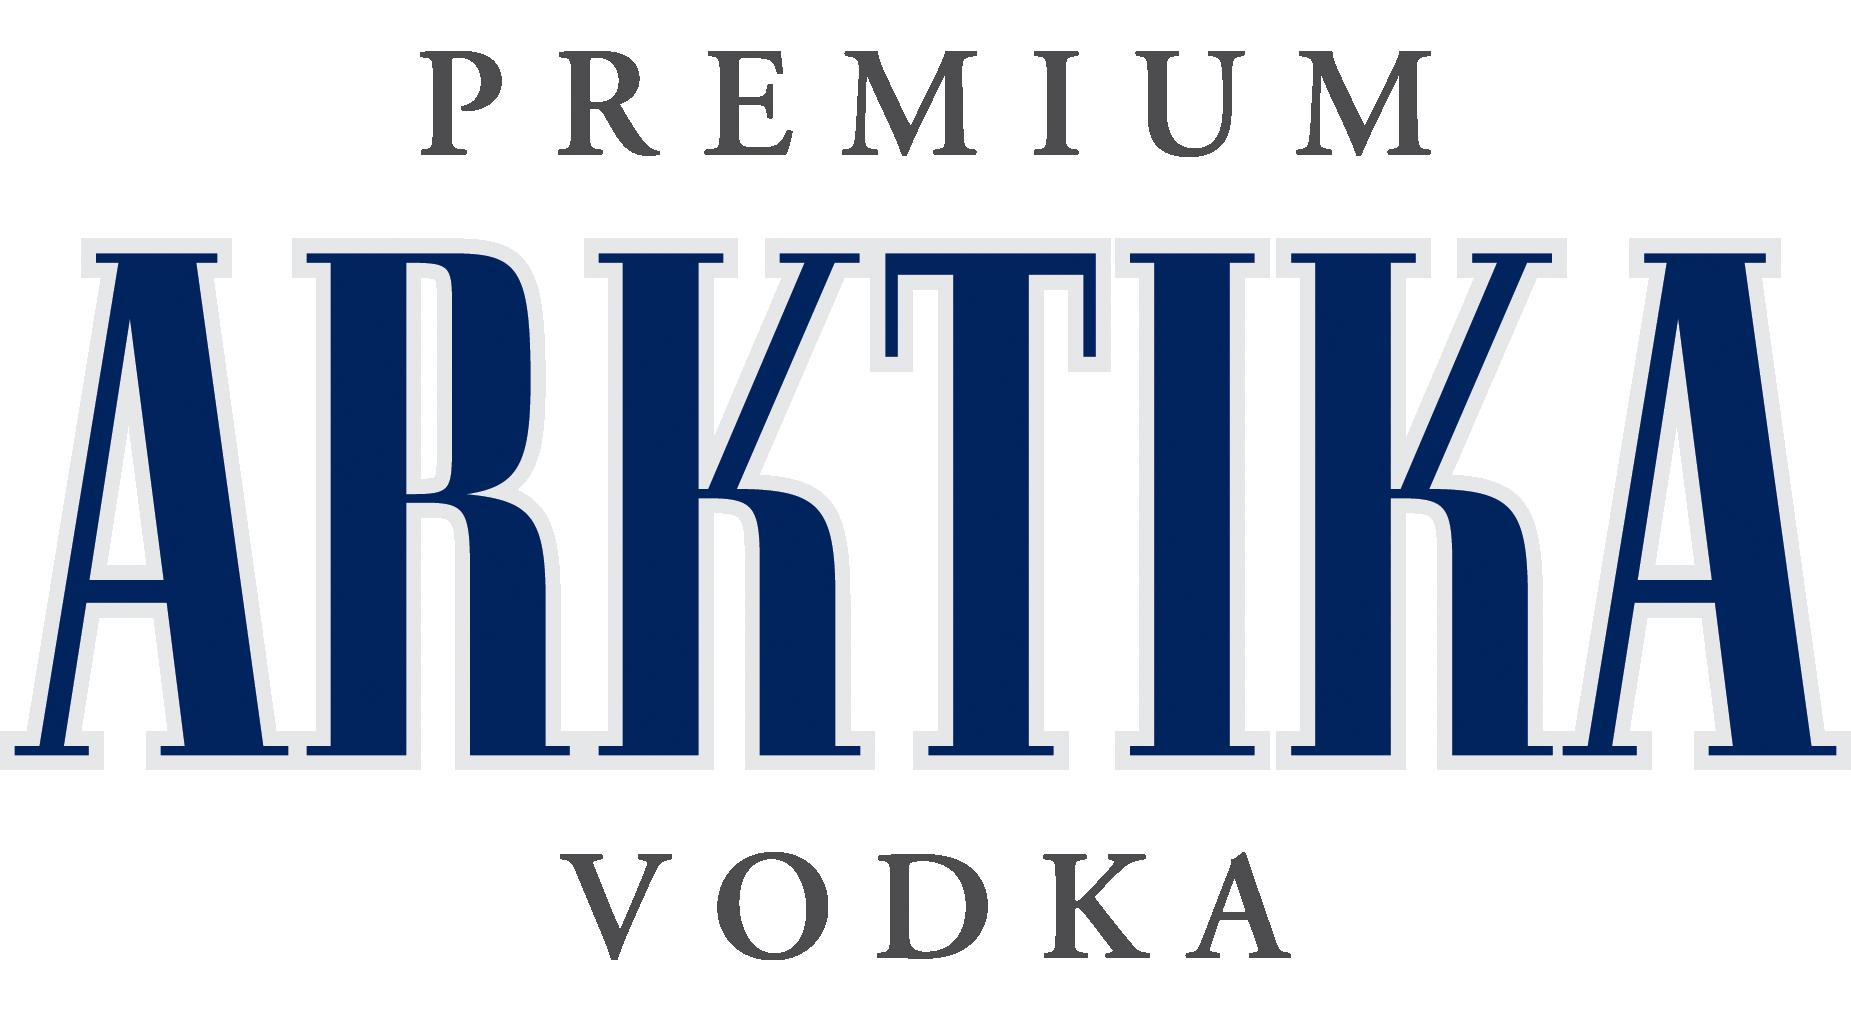 Arktika_logo_new.png